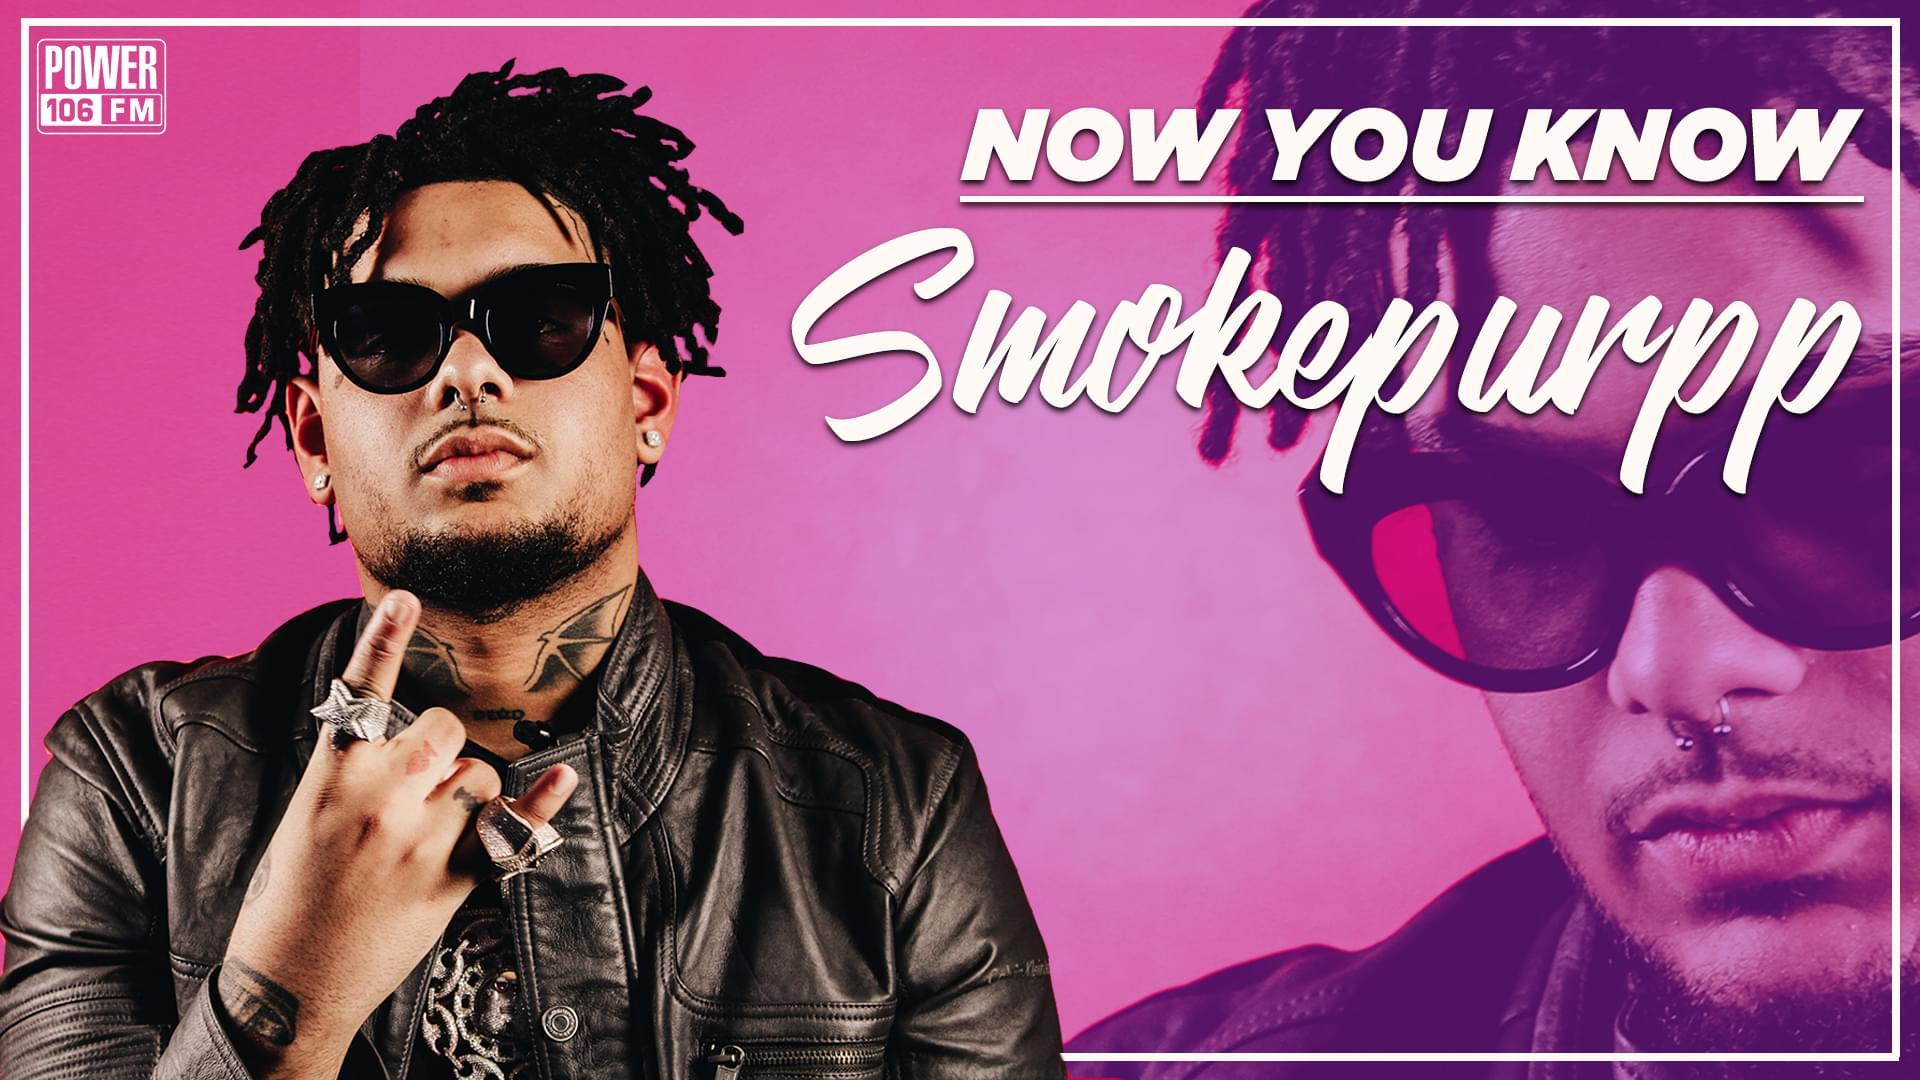 Smokepurpp on Friendship w/ Lil Pump, Coming Up w/ XXXTentacion + Secret Guilty Pleasure [WATCH]